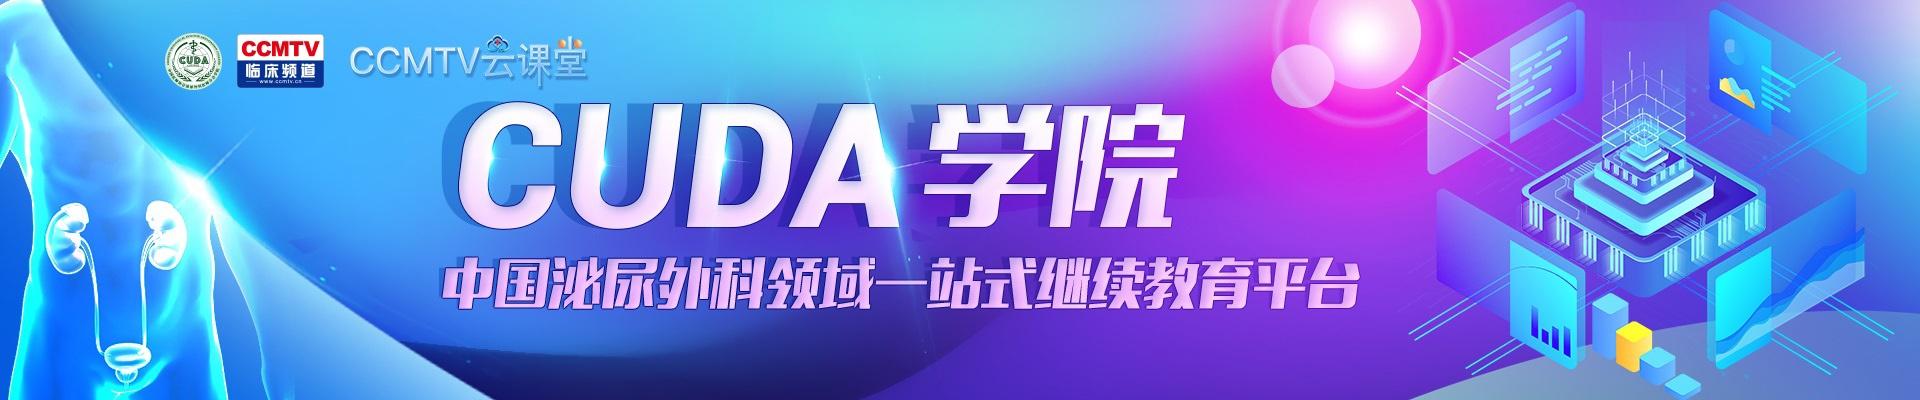 CUDA學院 —— 中國泌尿外科領域一站式繼續教育平臺